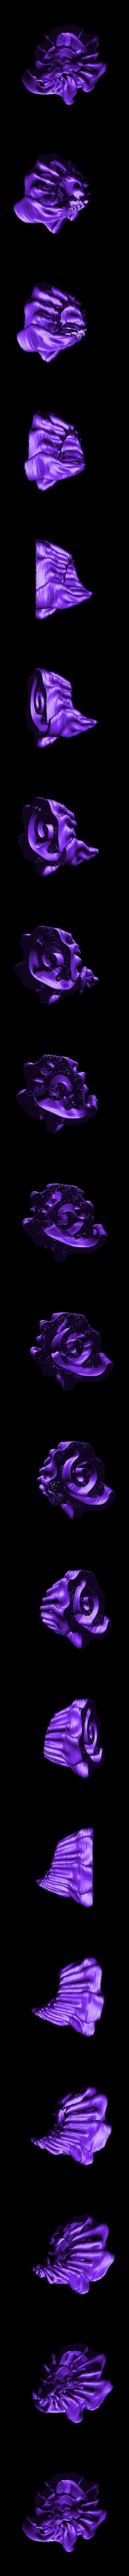 spiral2.stl Download free STL file Weird terrain collection • 3D printer object, ferjerez3d